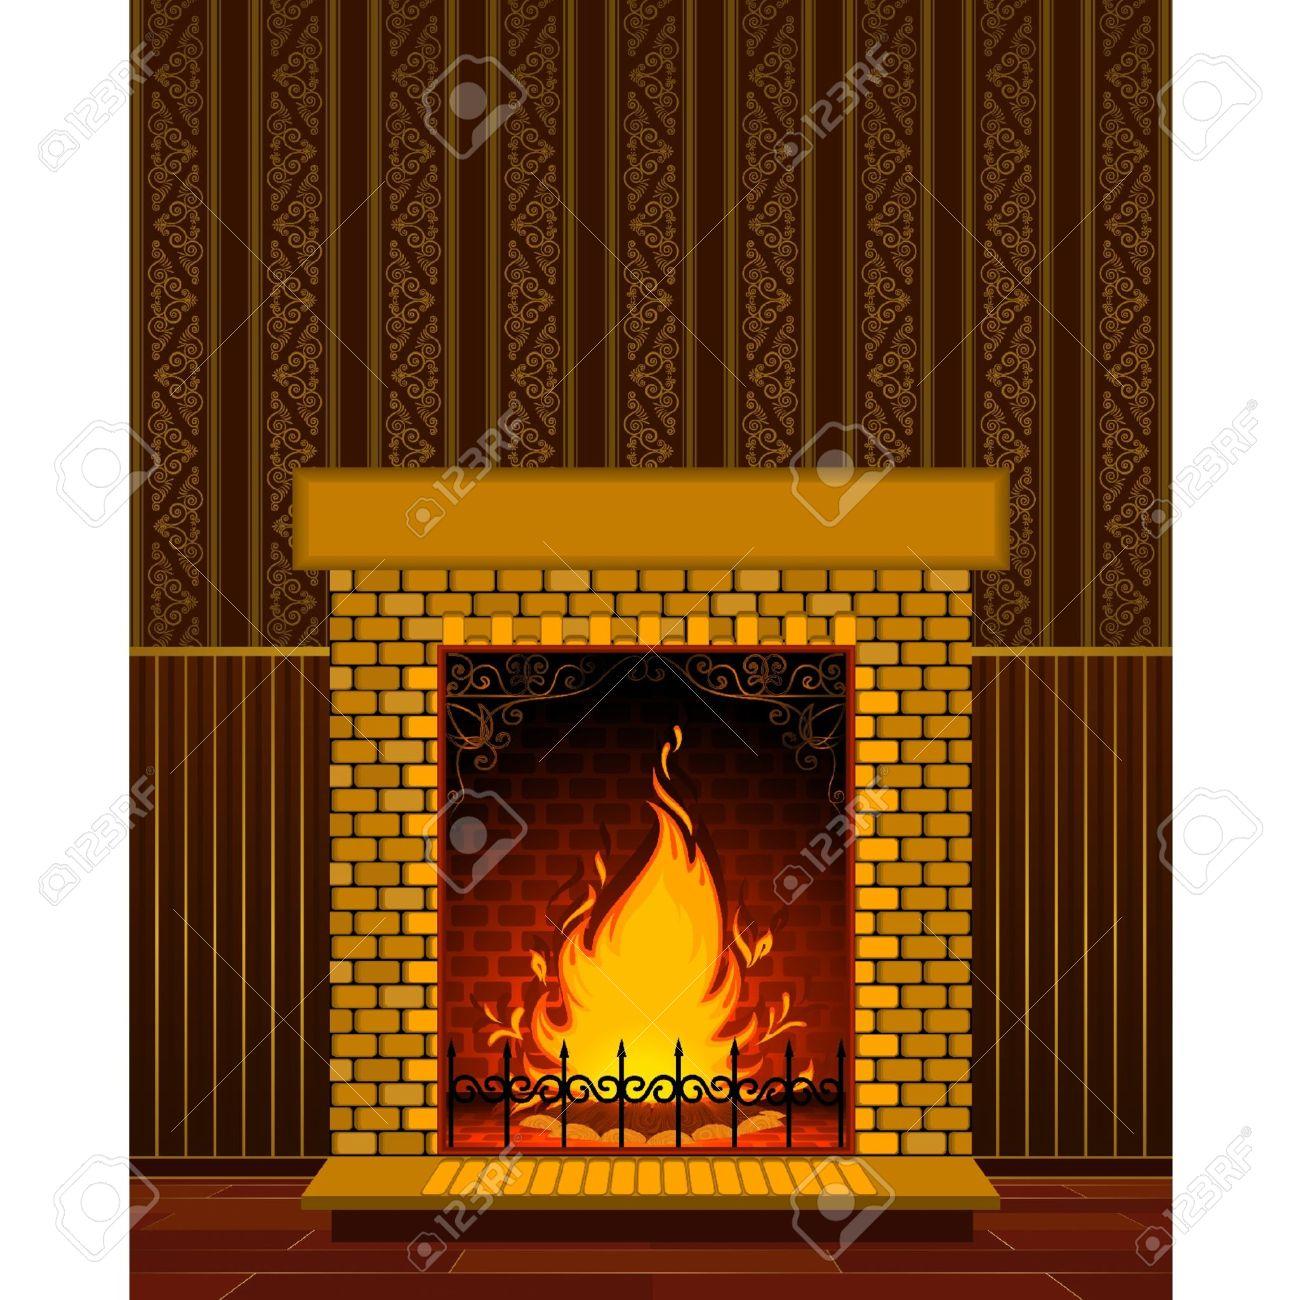 chimenea de piedra de lujo con llama foto de archivo